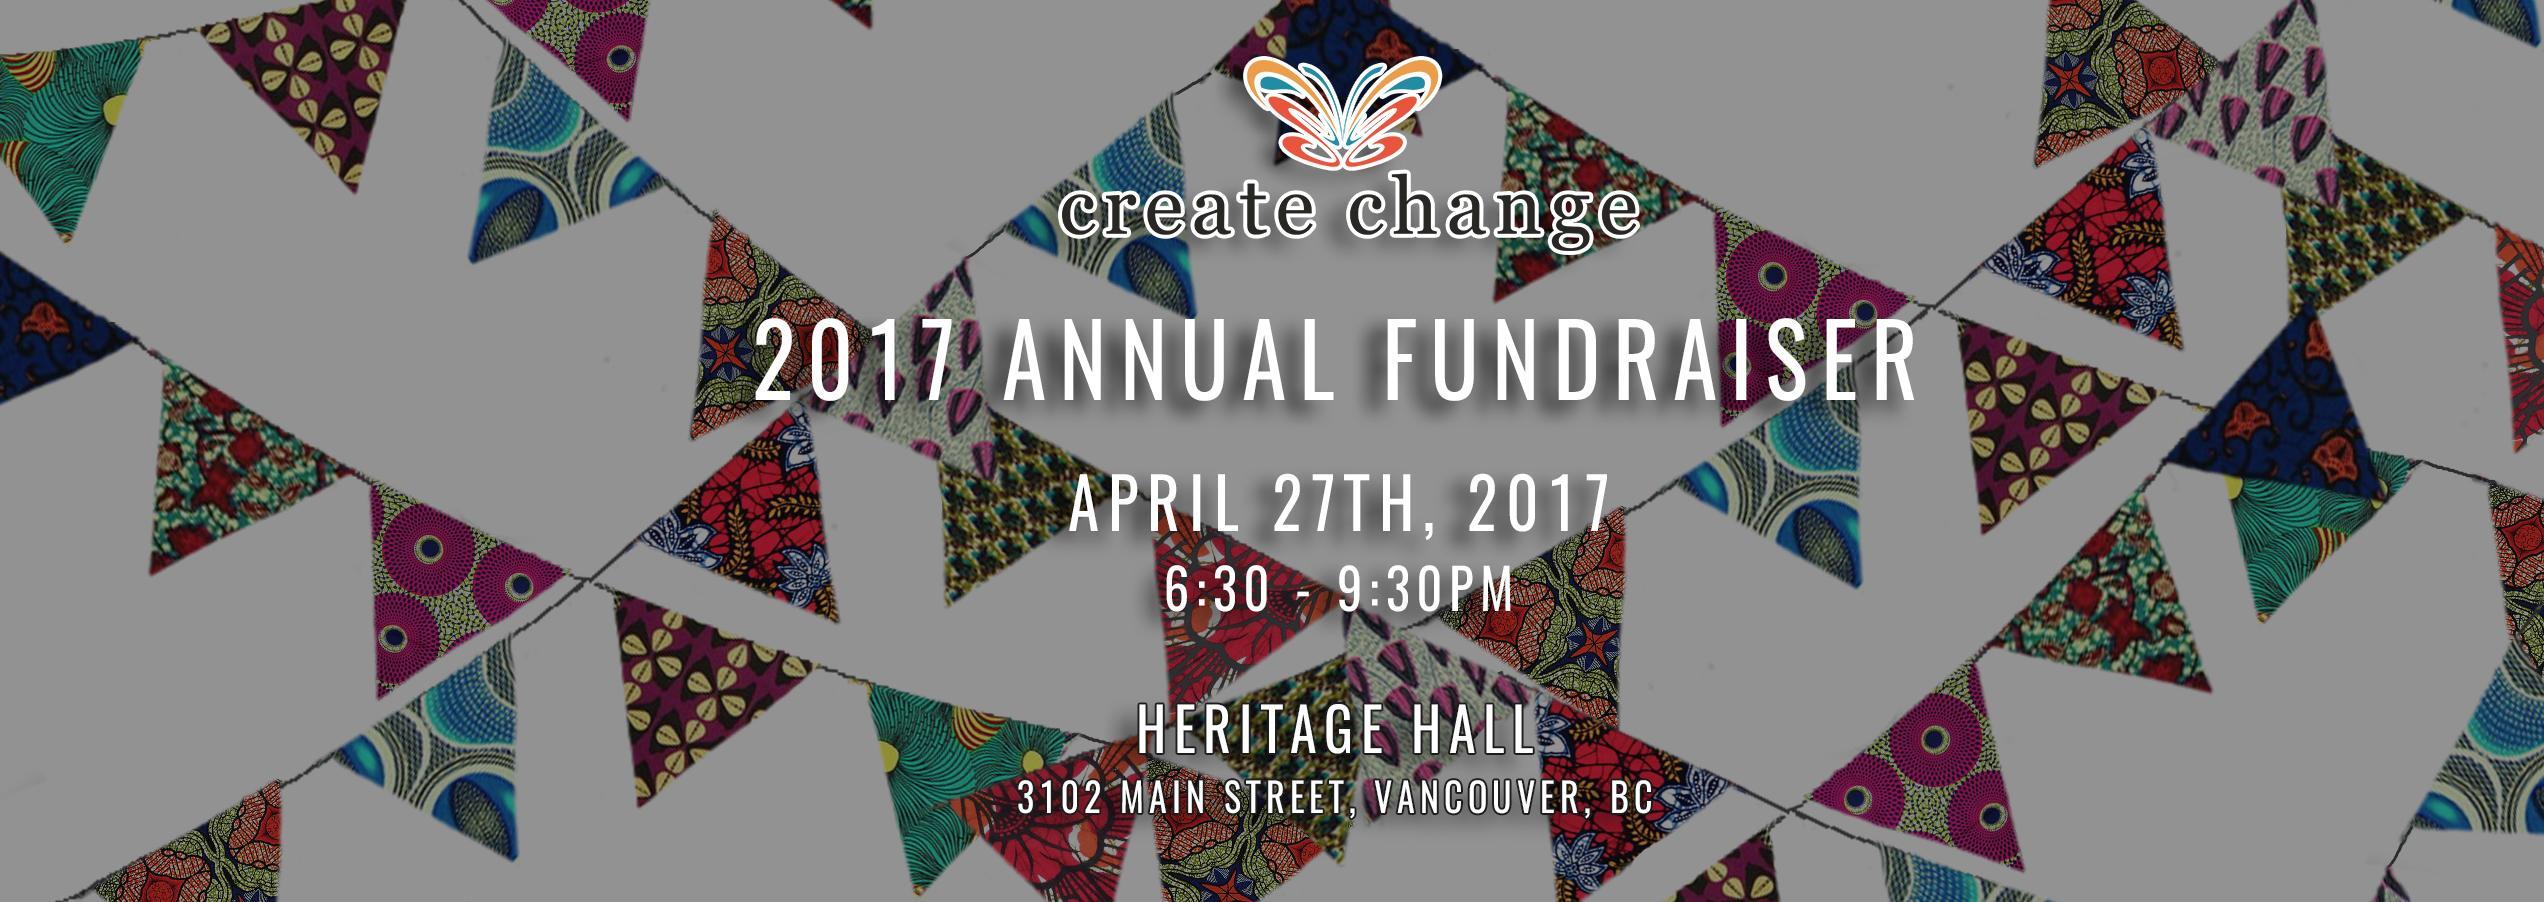 Create Change Annual Fundraiser